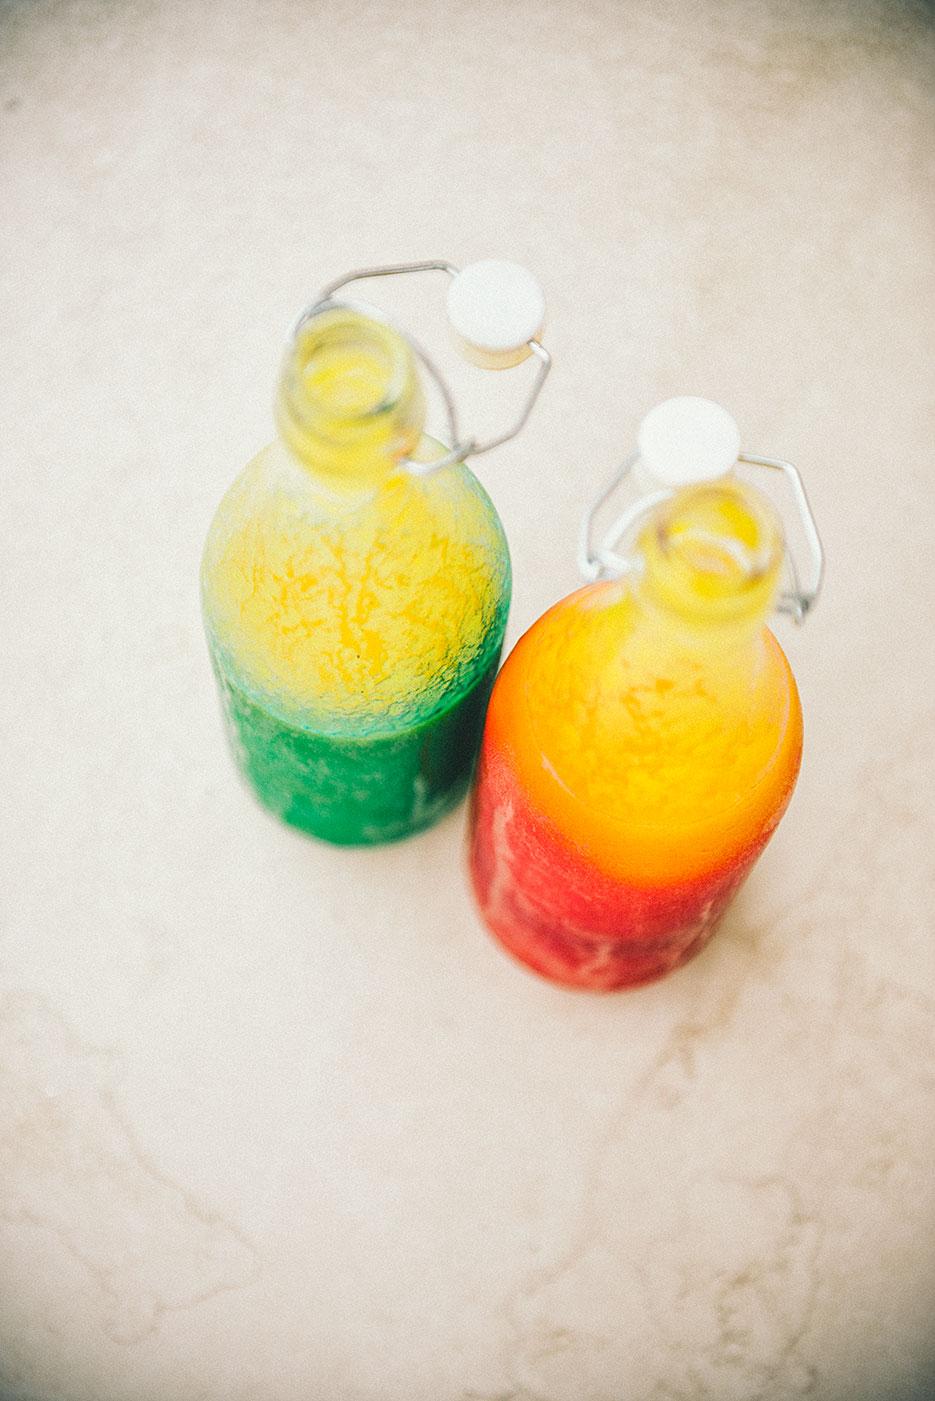 Mango White Wine Sangria. Food, Beverage & Lifestyle Photography by professional photographer Naina Redhu